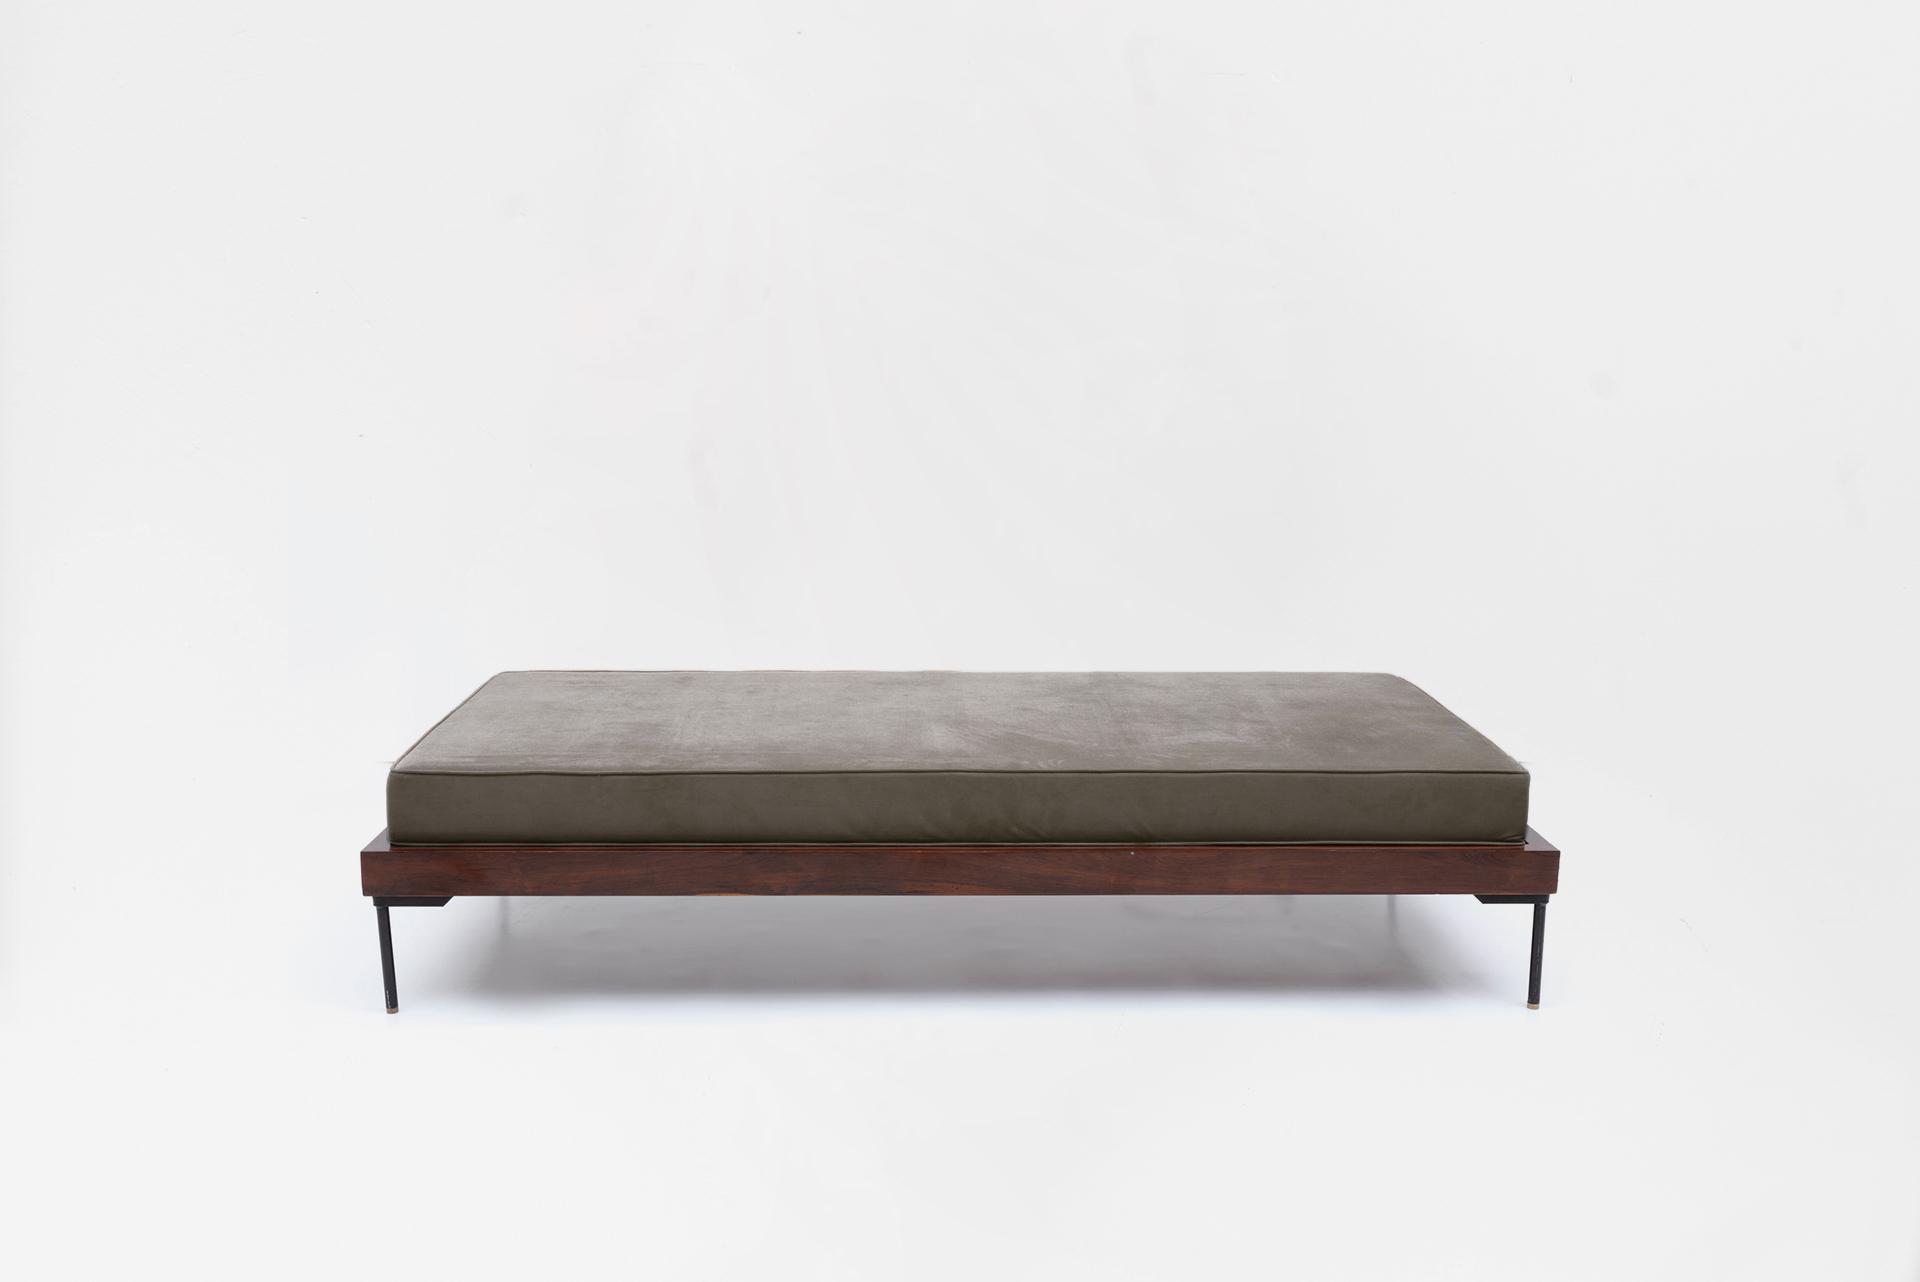 Day bed Manufactured by Unilabor Brasil, 1960 Jacaranda wood, iron, fabric upholstery